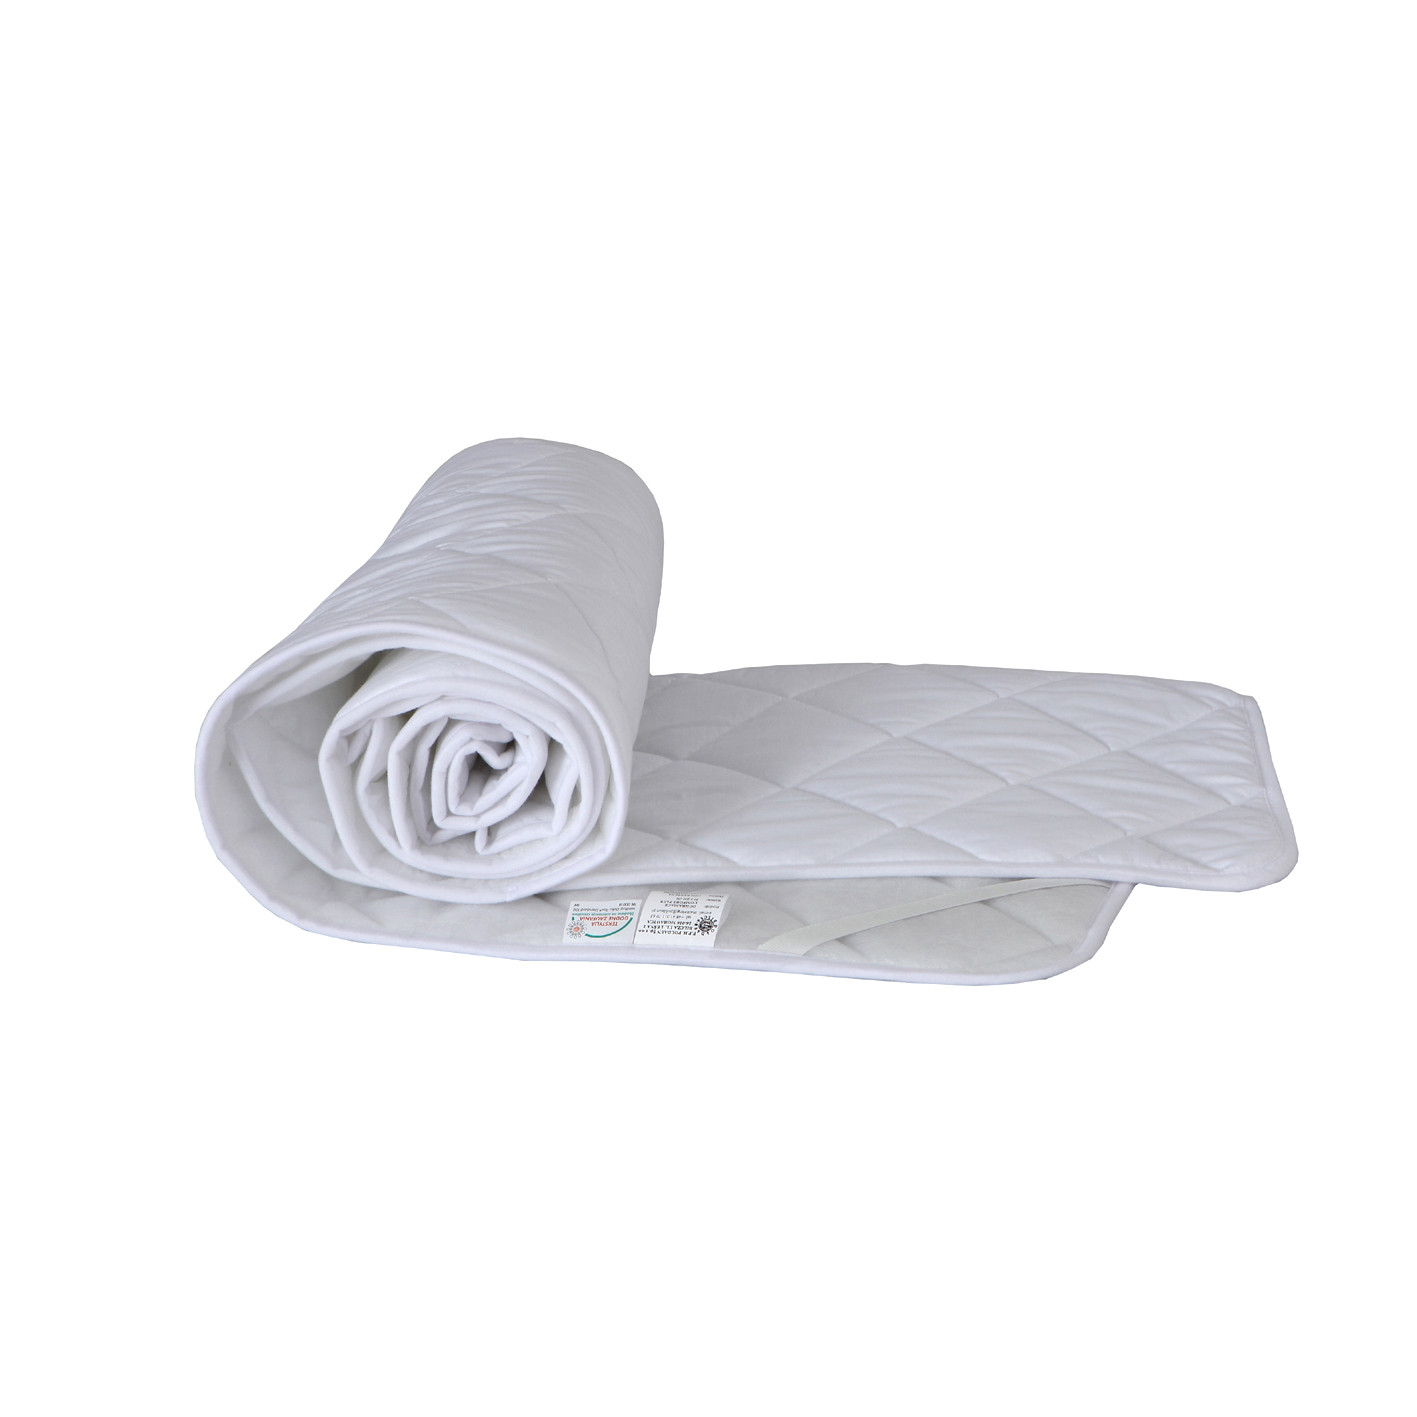 Ochraniacz na materac Comfort Plus 90x200